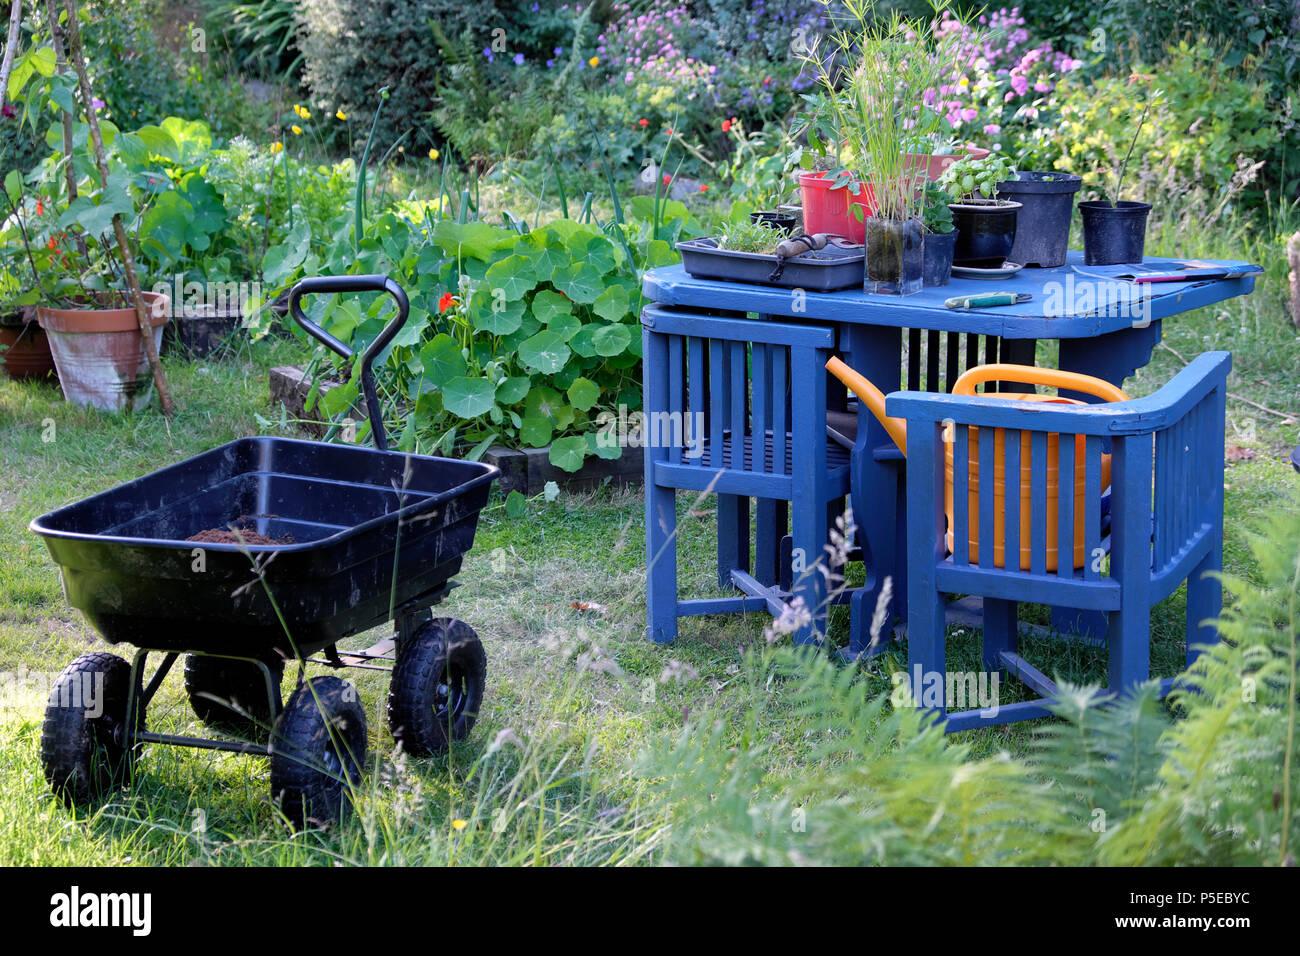 Garden Chair Flowers Uk High Resolution Stock Photography ...